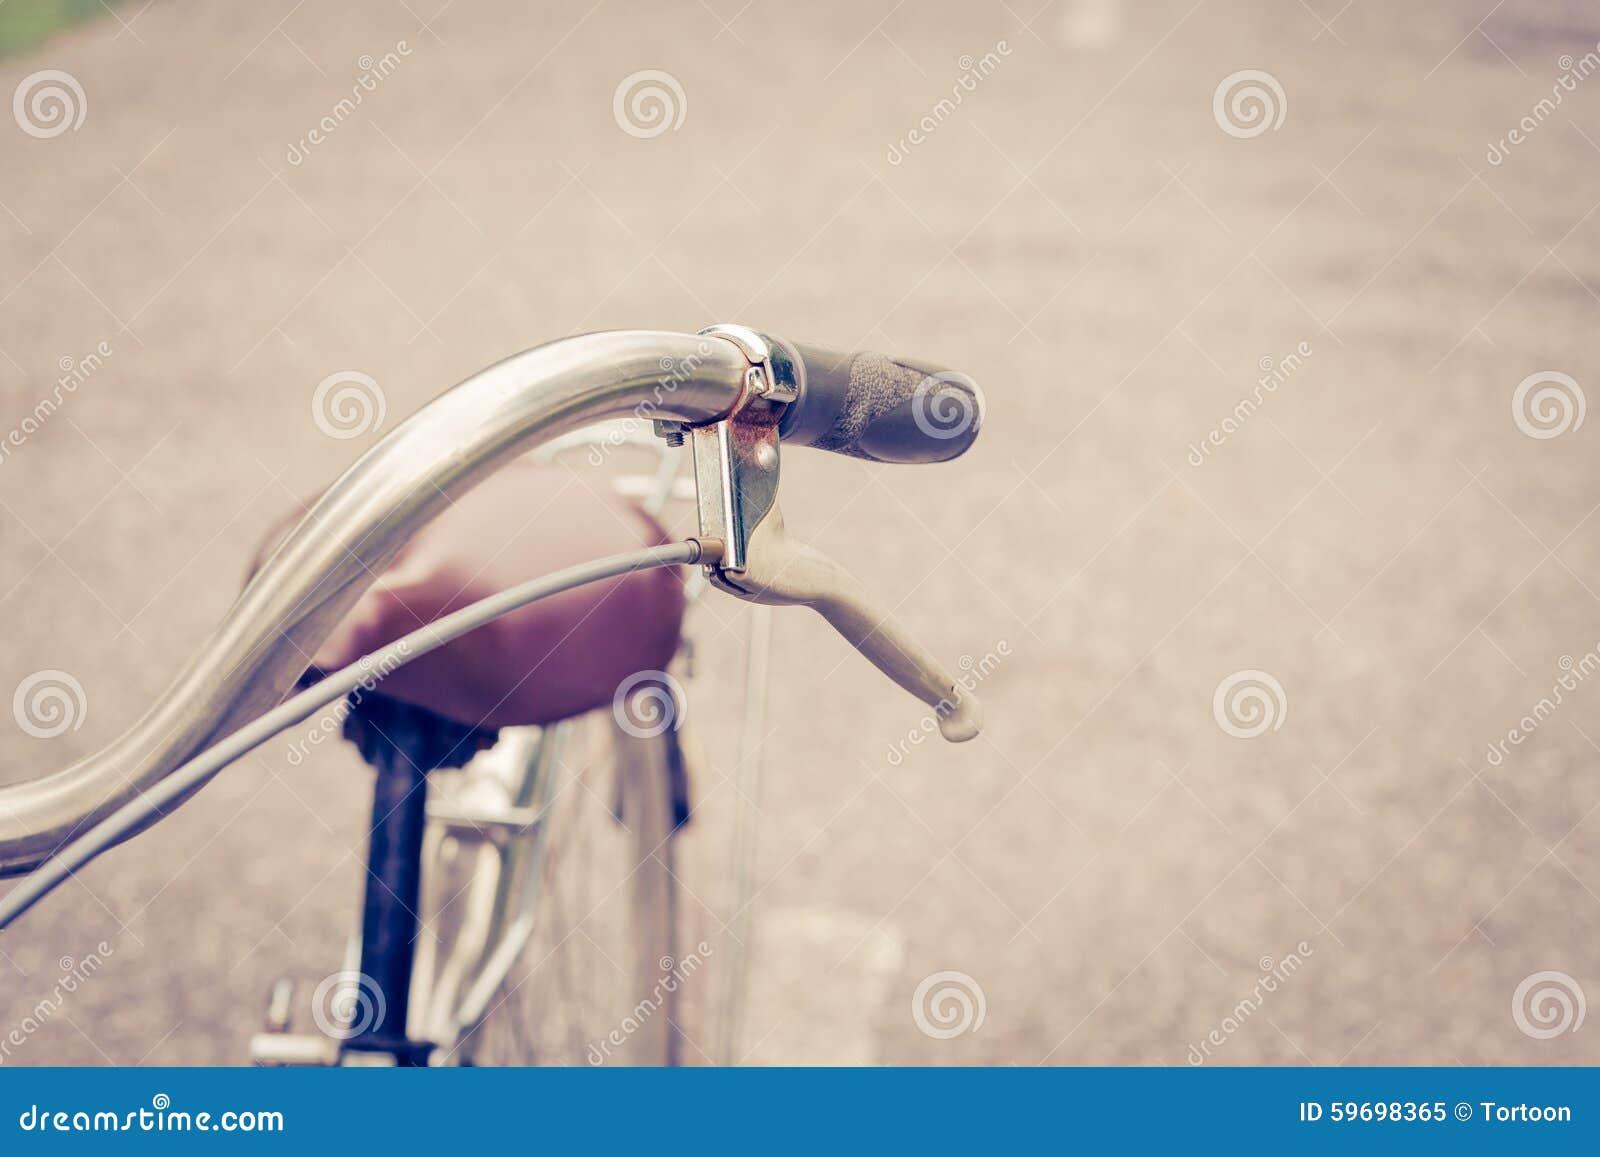 Rem uitstekende fiets